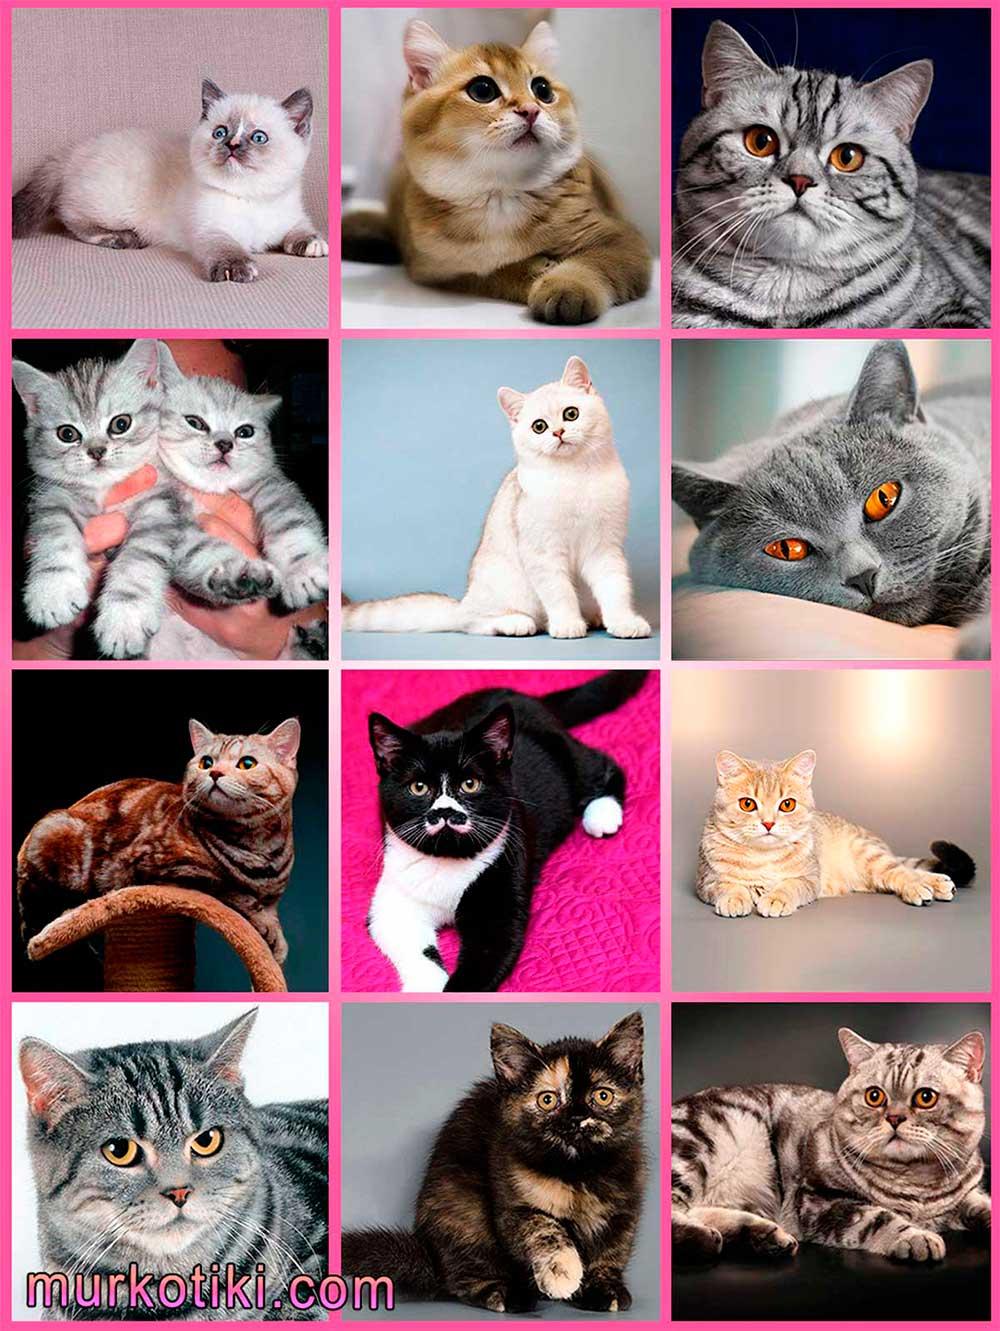 Шотландская вислоухая кошка— скоттиш фолд и хайленд фолд